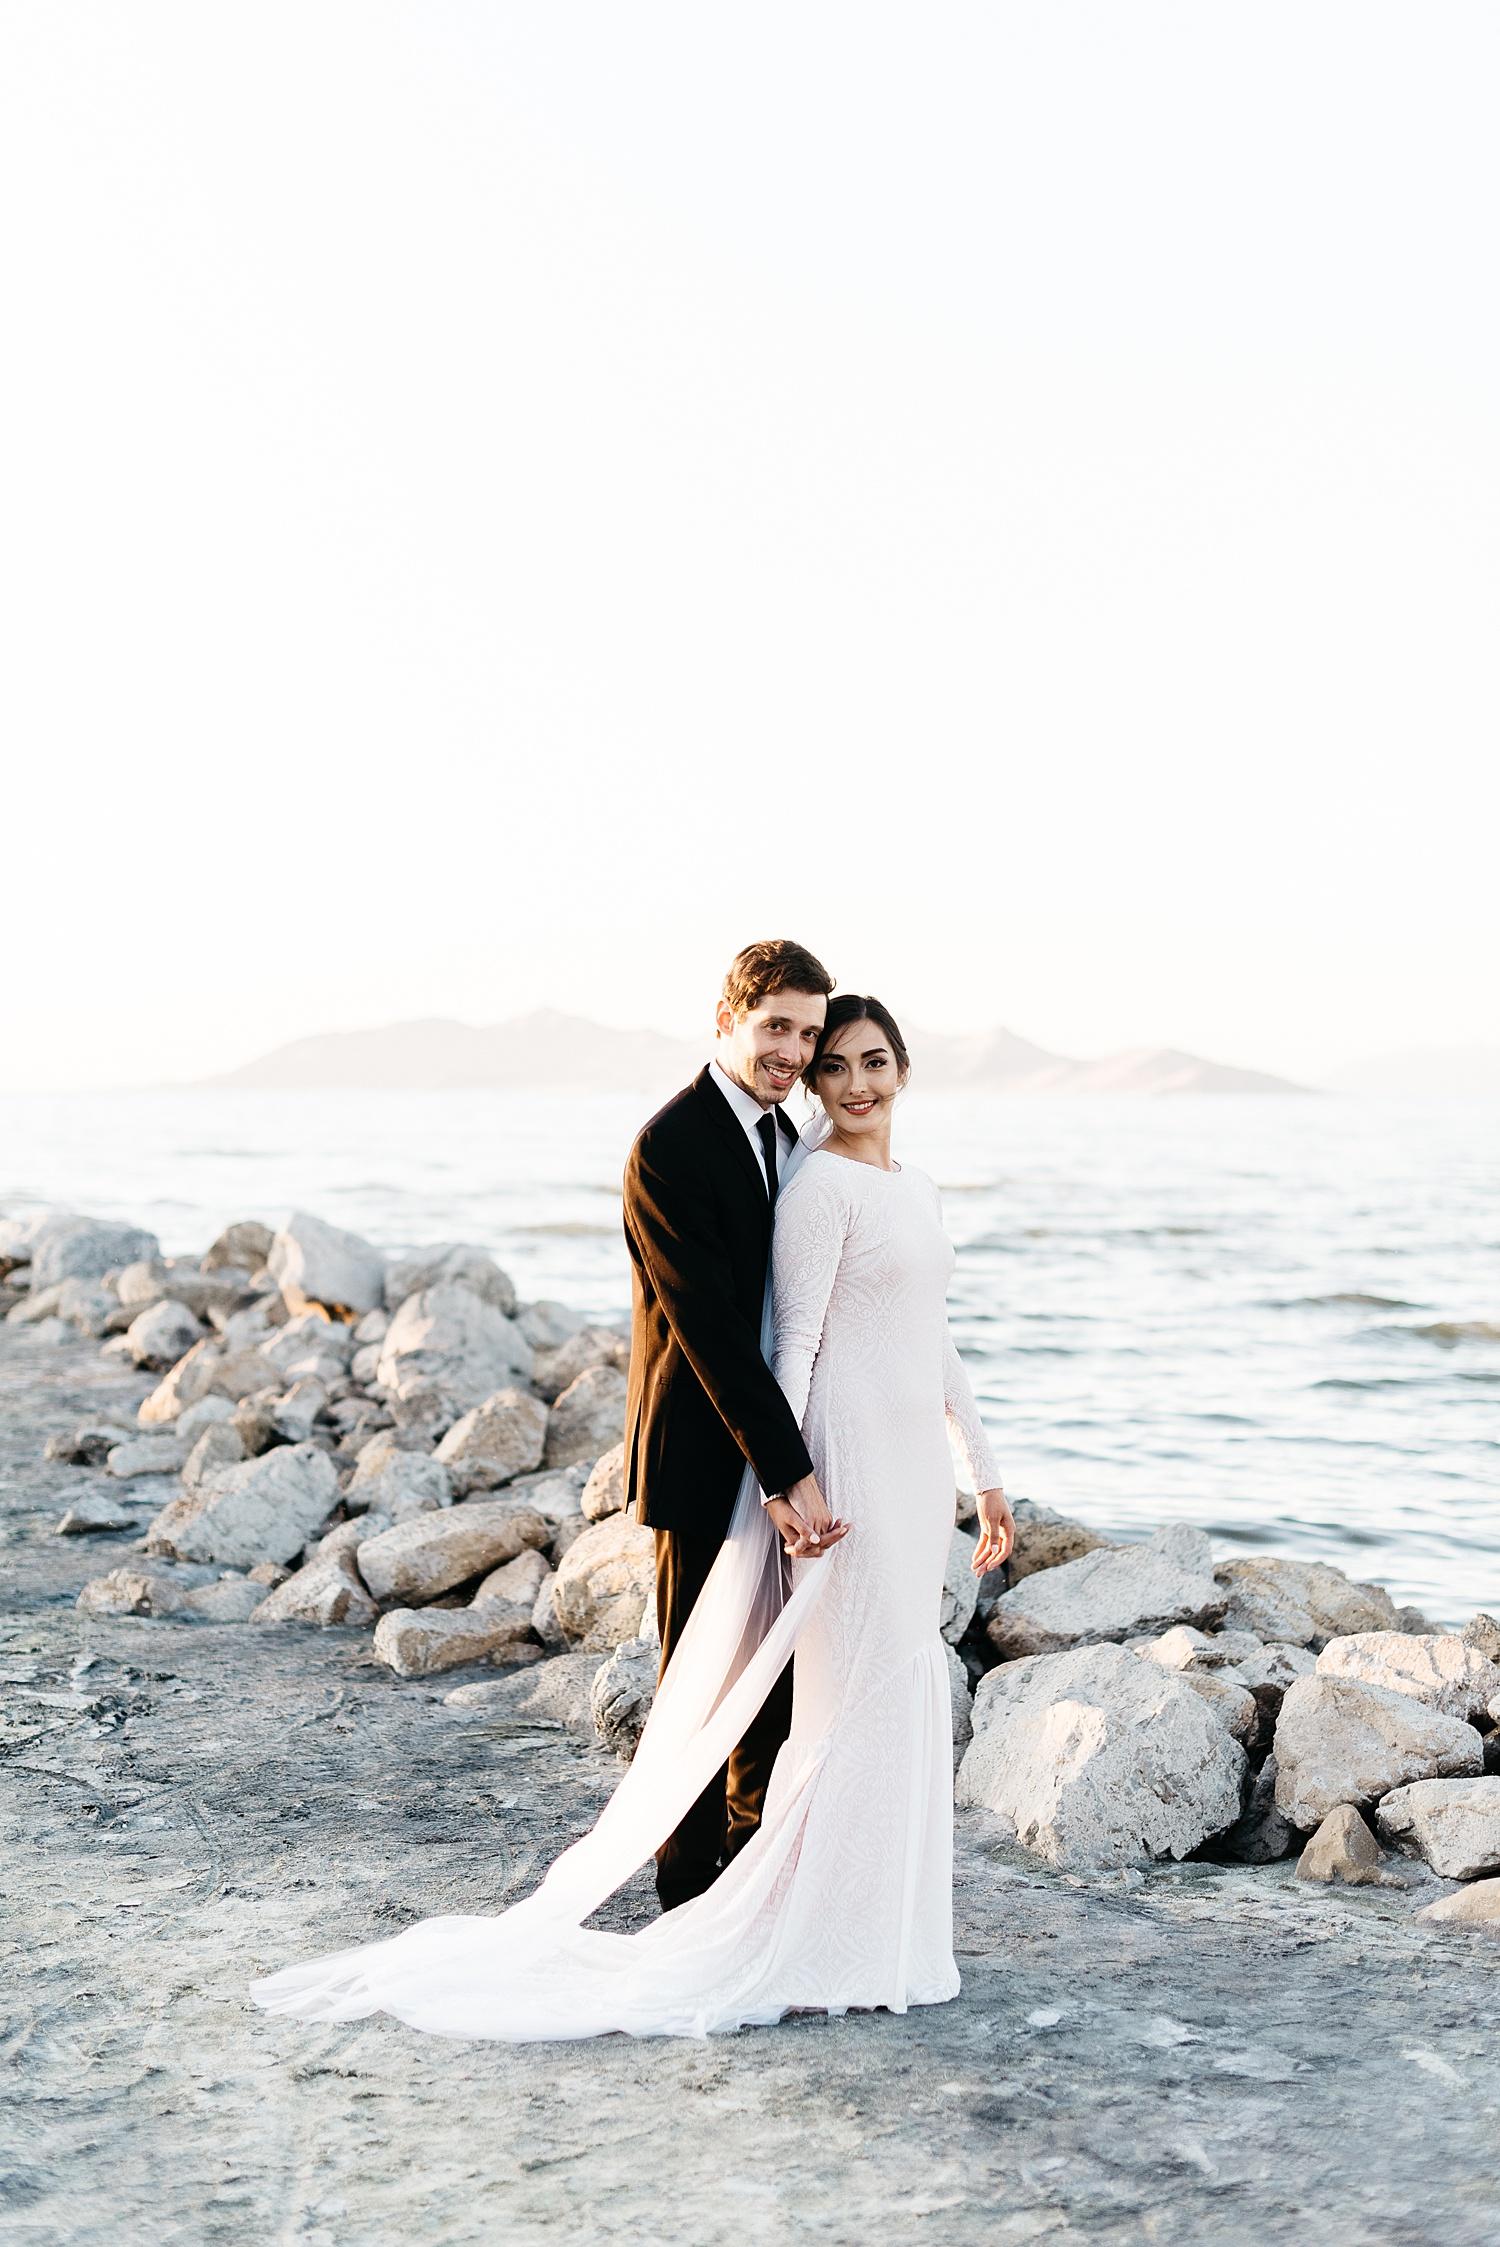 Zandra Barriga Photo - Cassie and Tristan Great Salt Lake Bridas_0011.jpg